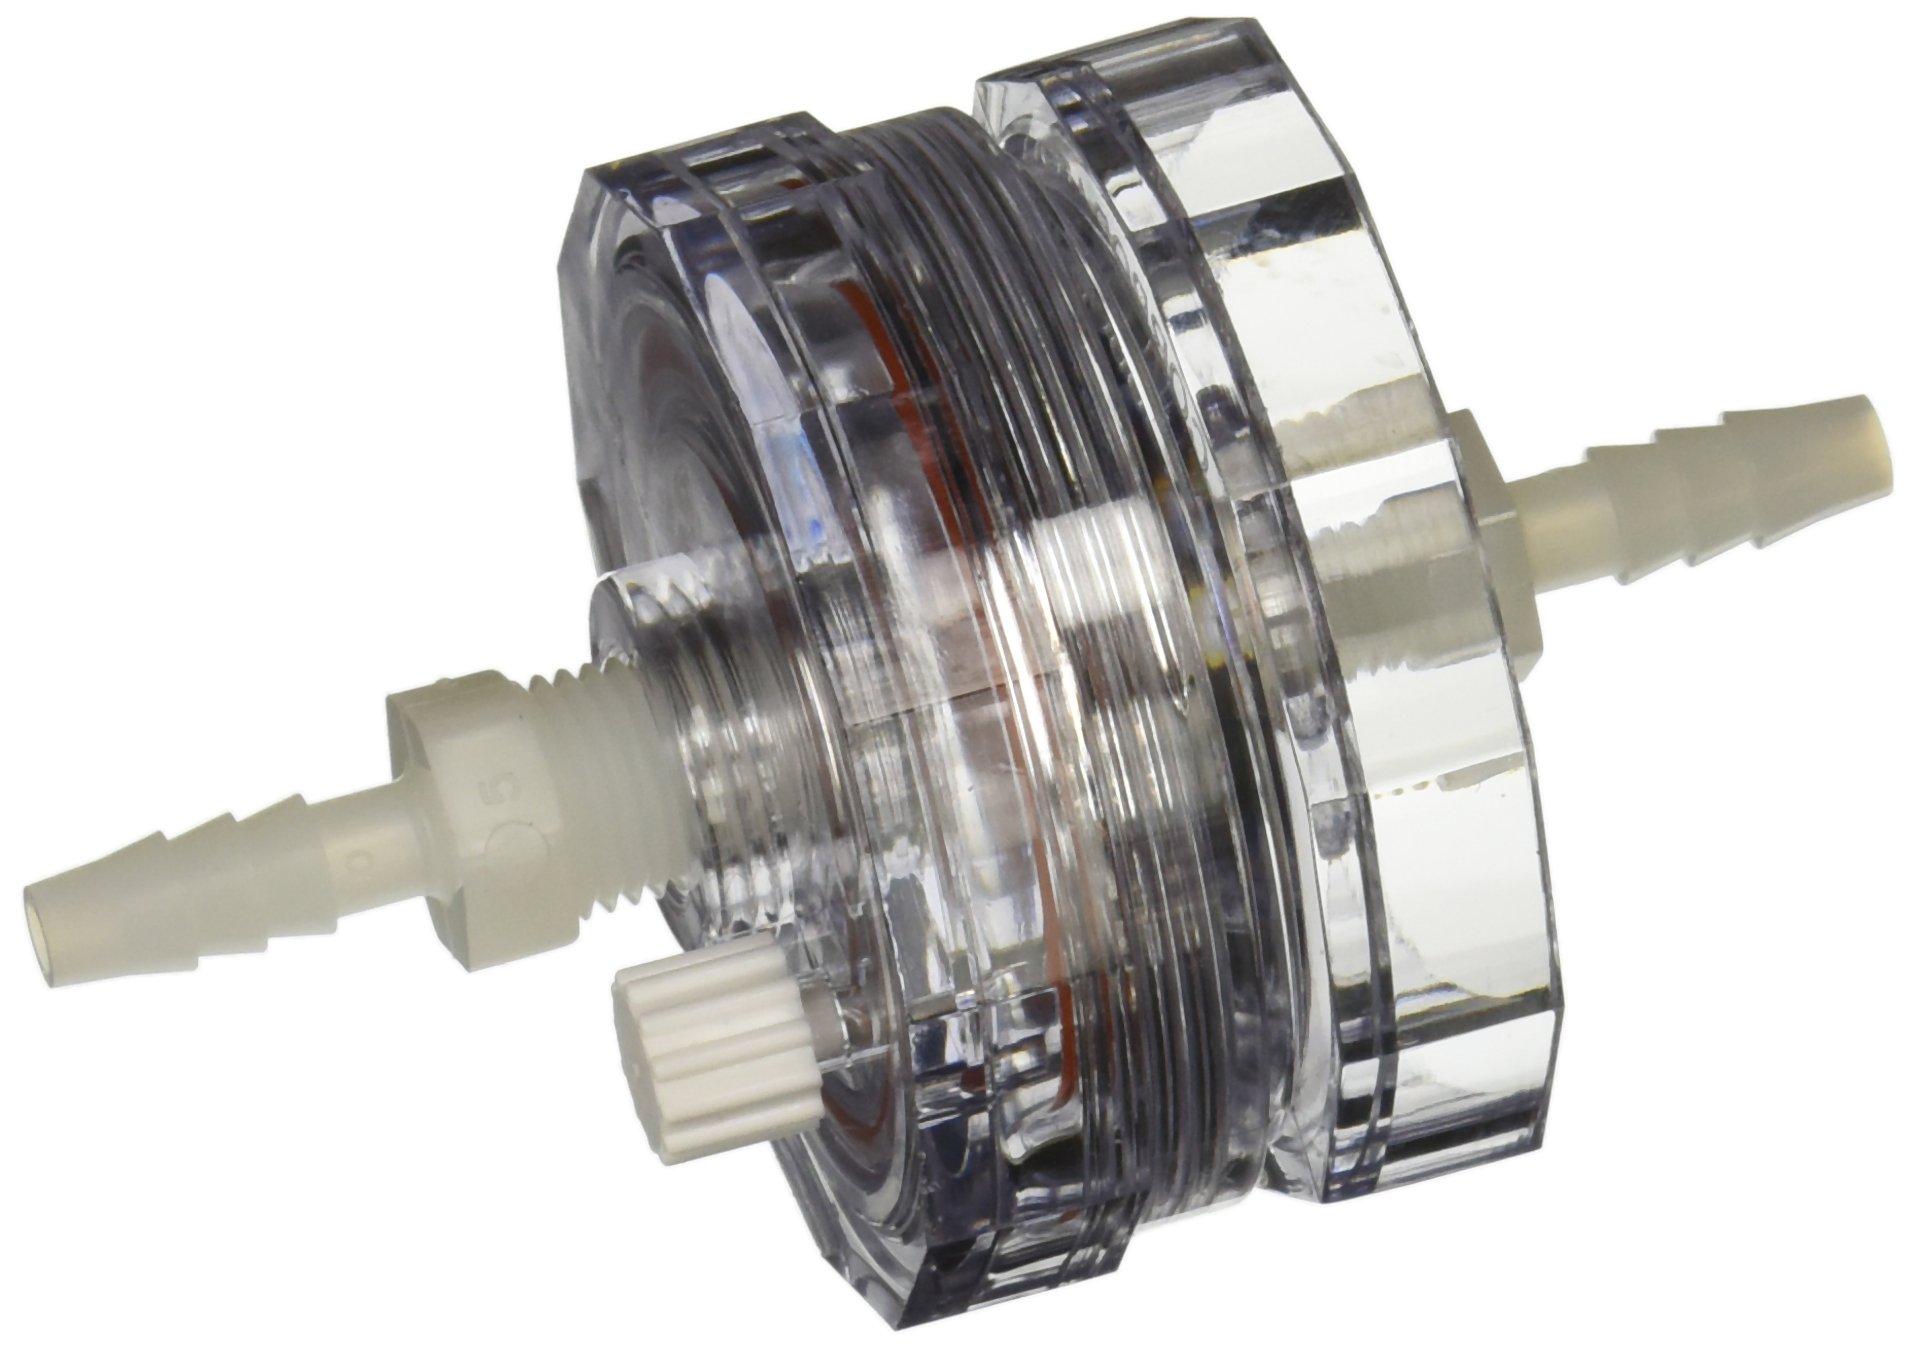 PALL 1119 Polycarbonate in-Line Filter Holder for 47 mm Filter Disc, Non-Sterile, 3.4 bar Maximum Operating Pressure, 5.8 cm Length x 6.4 cm Diameter